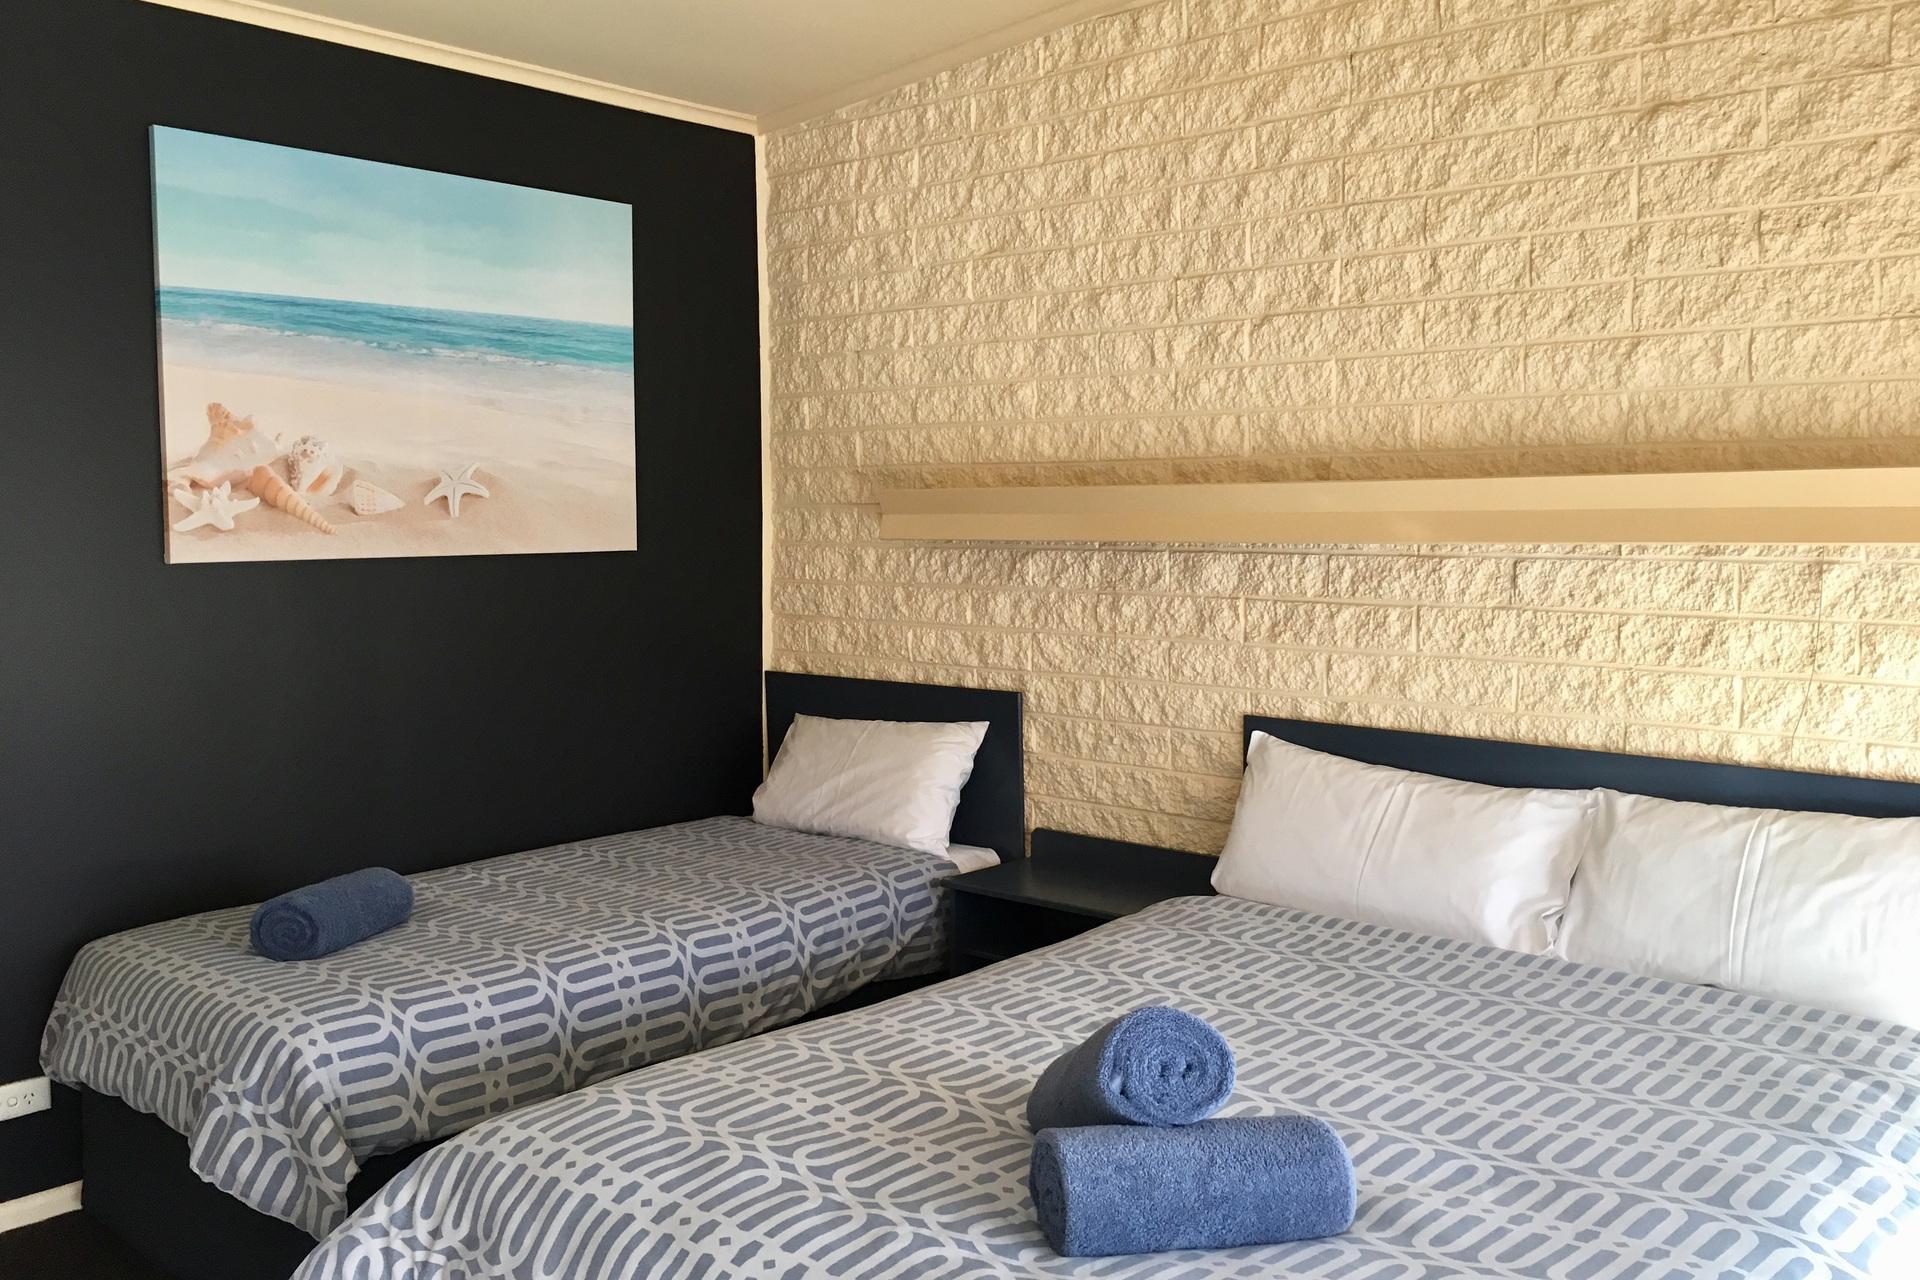 c - Rye Beach Motel